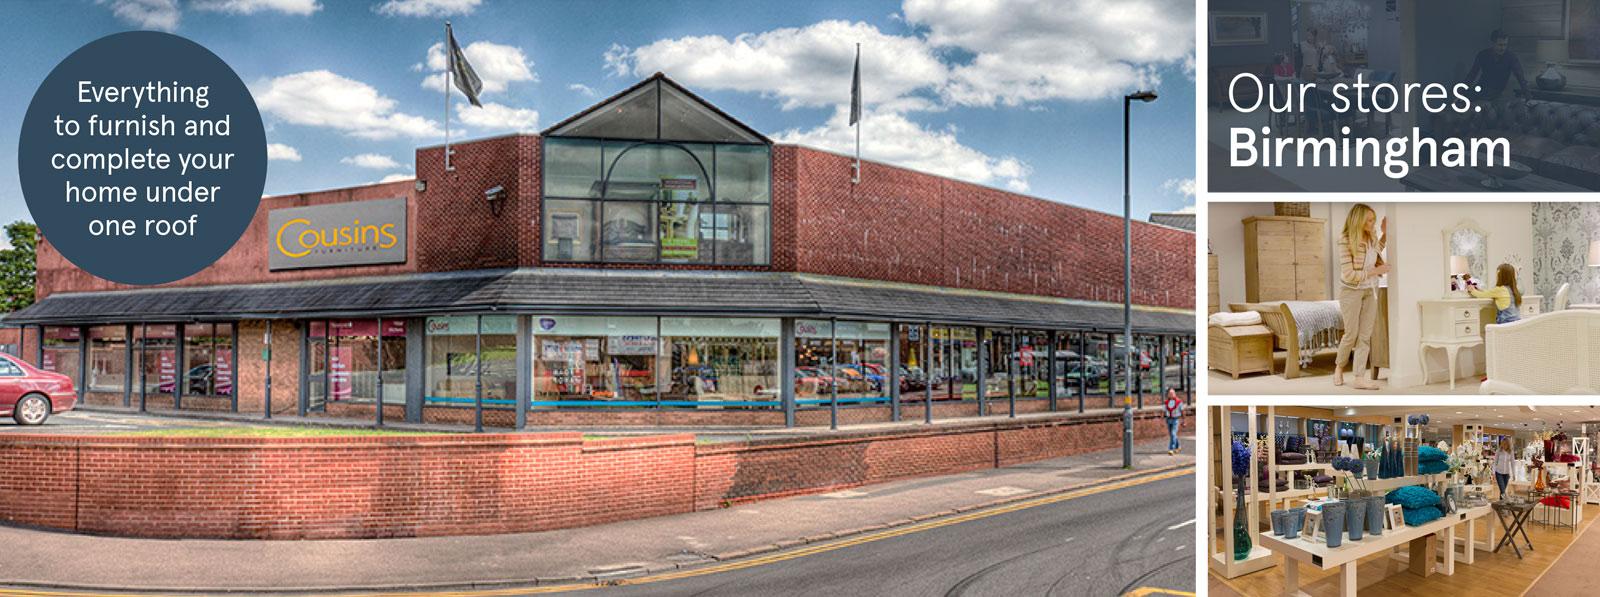 Cousins Furniture Store - Birmingham